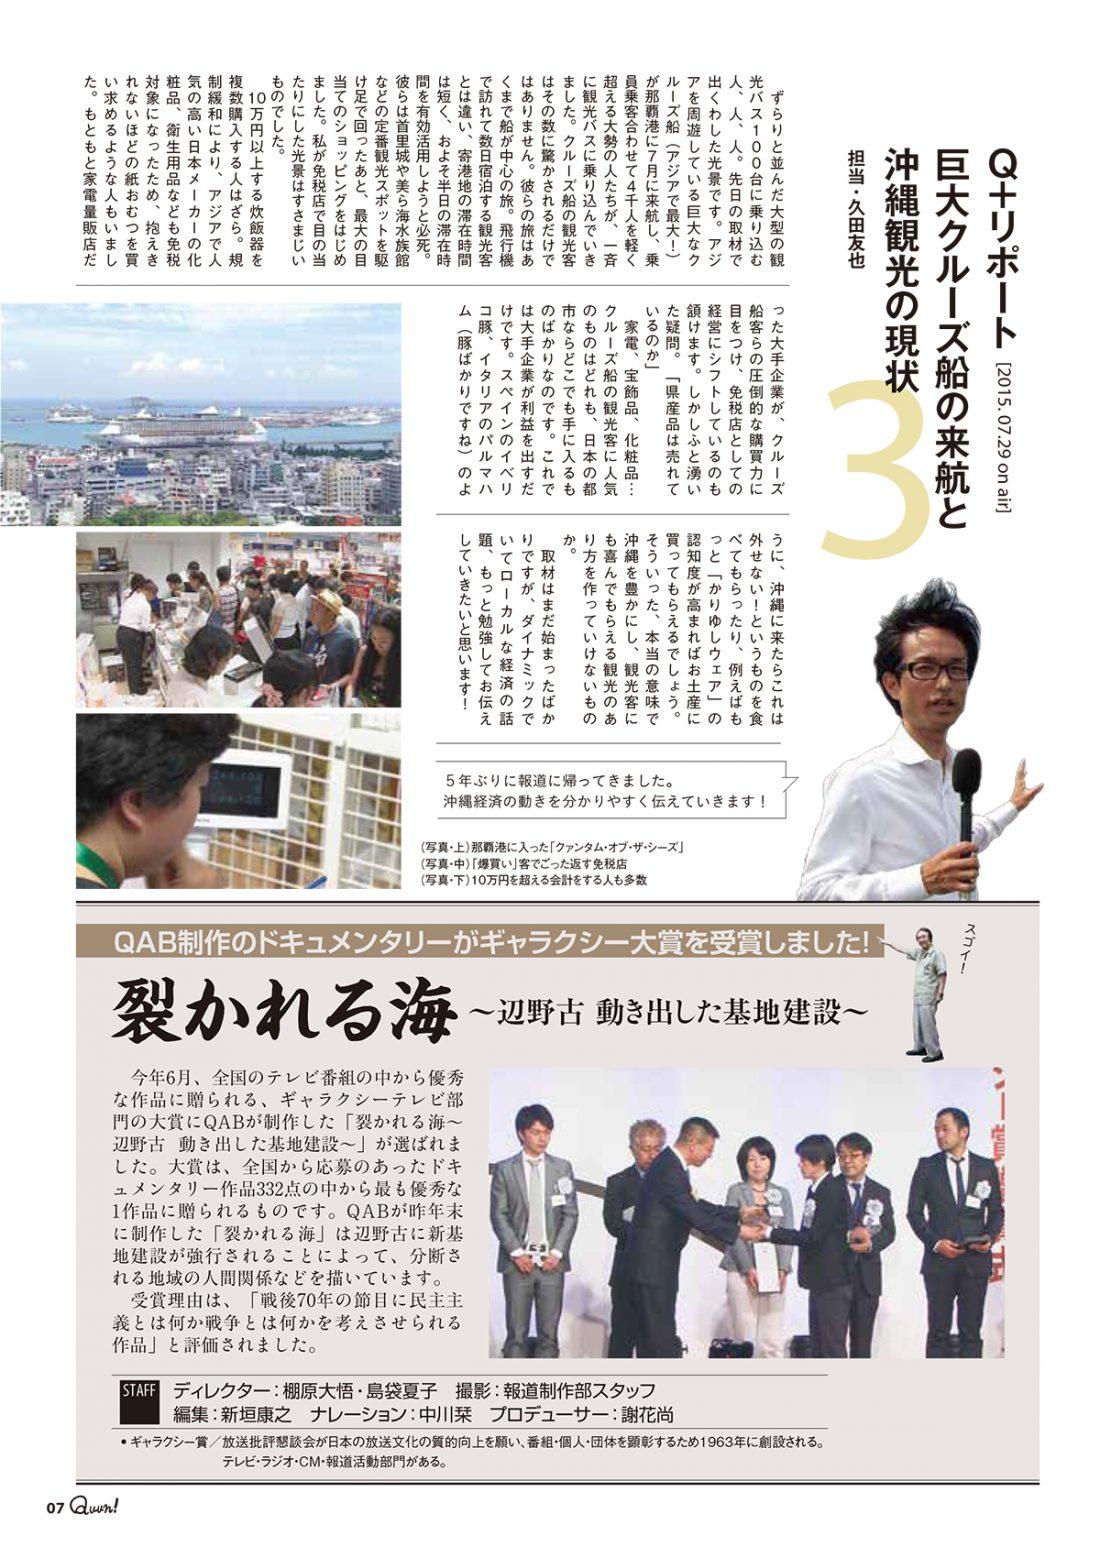 https://www.qab.co.jp/qgoro/wp-content/uploads/quun_0409-1100x1558.jpg